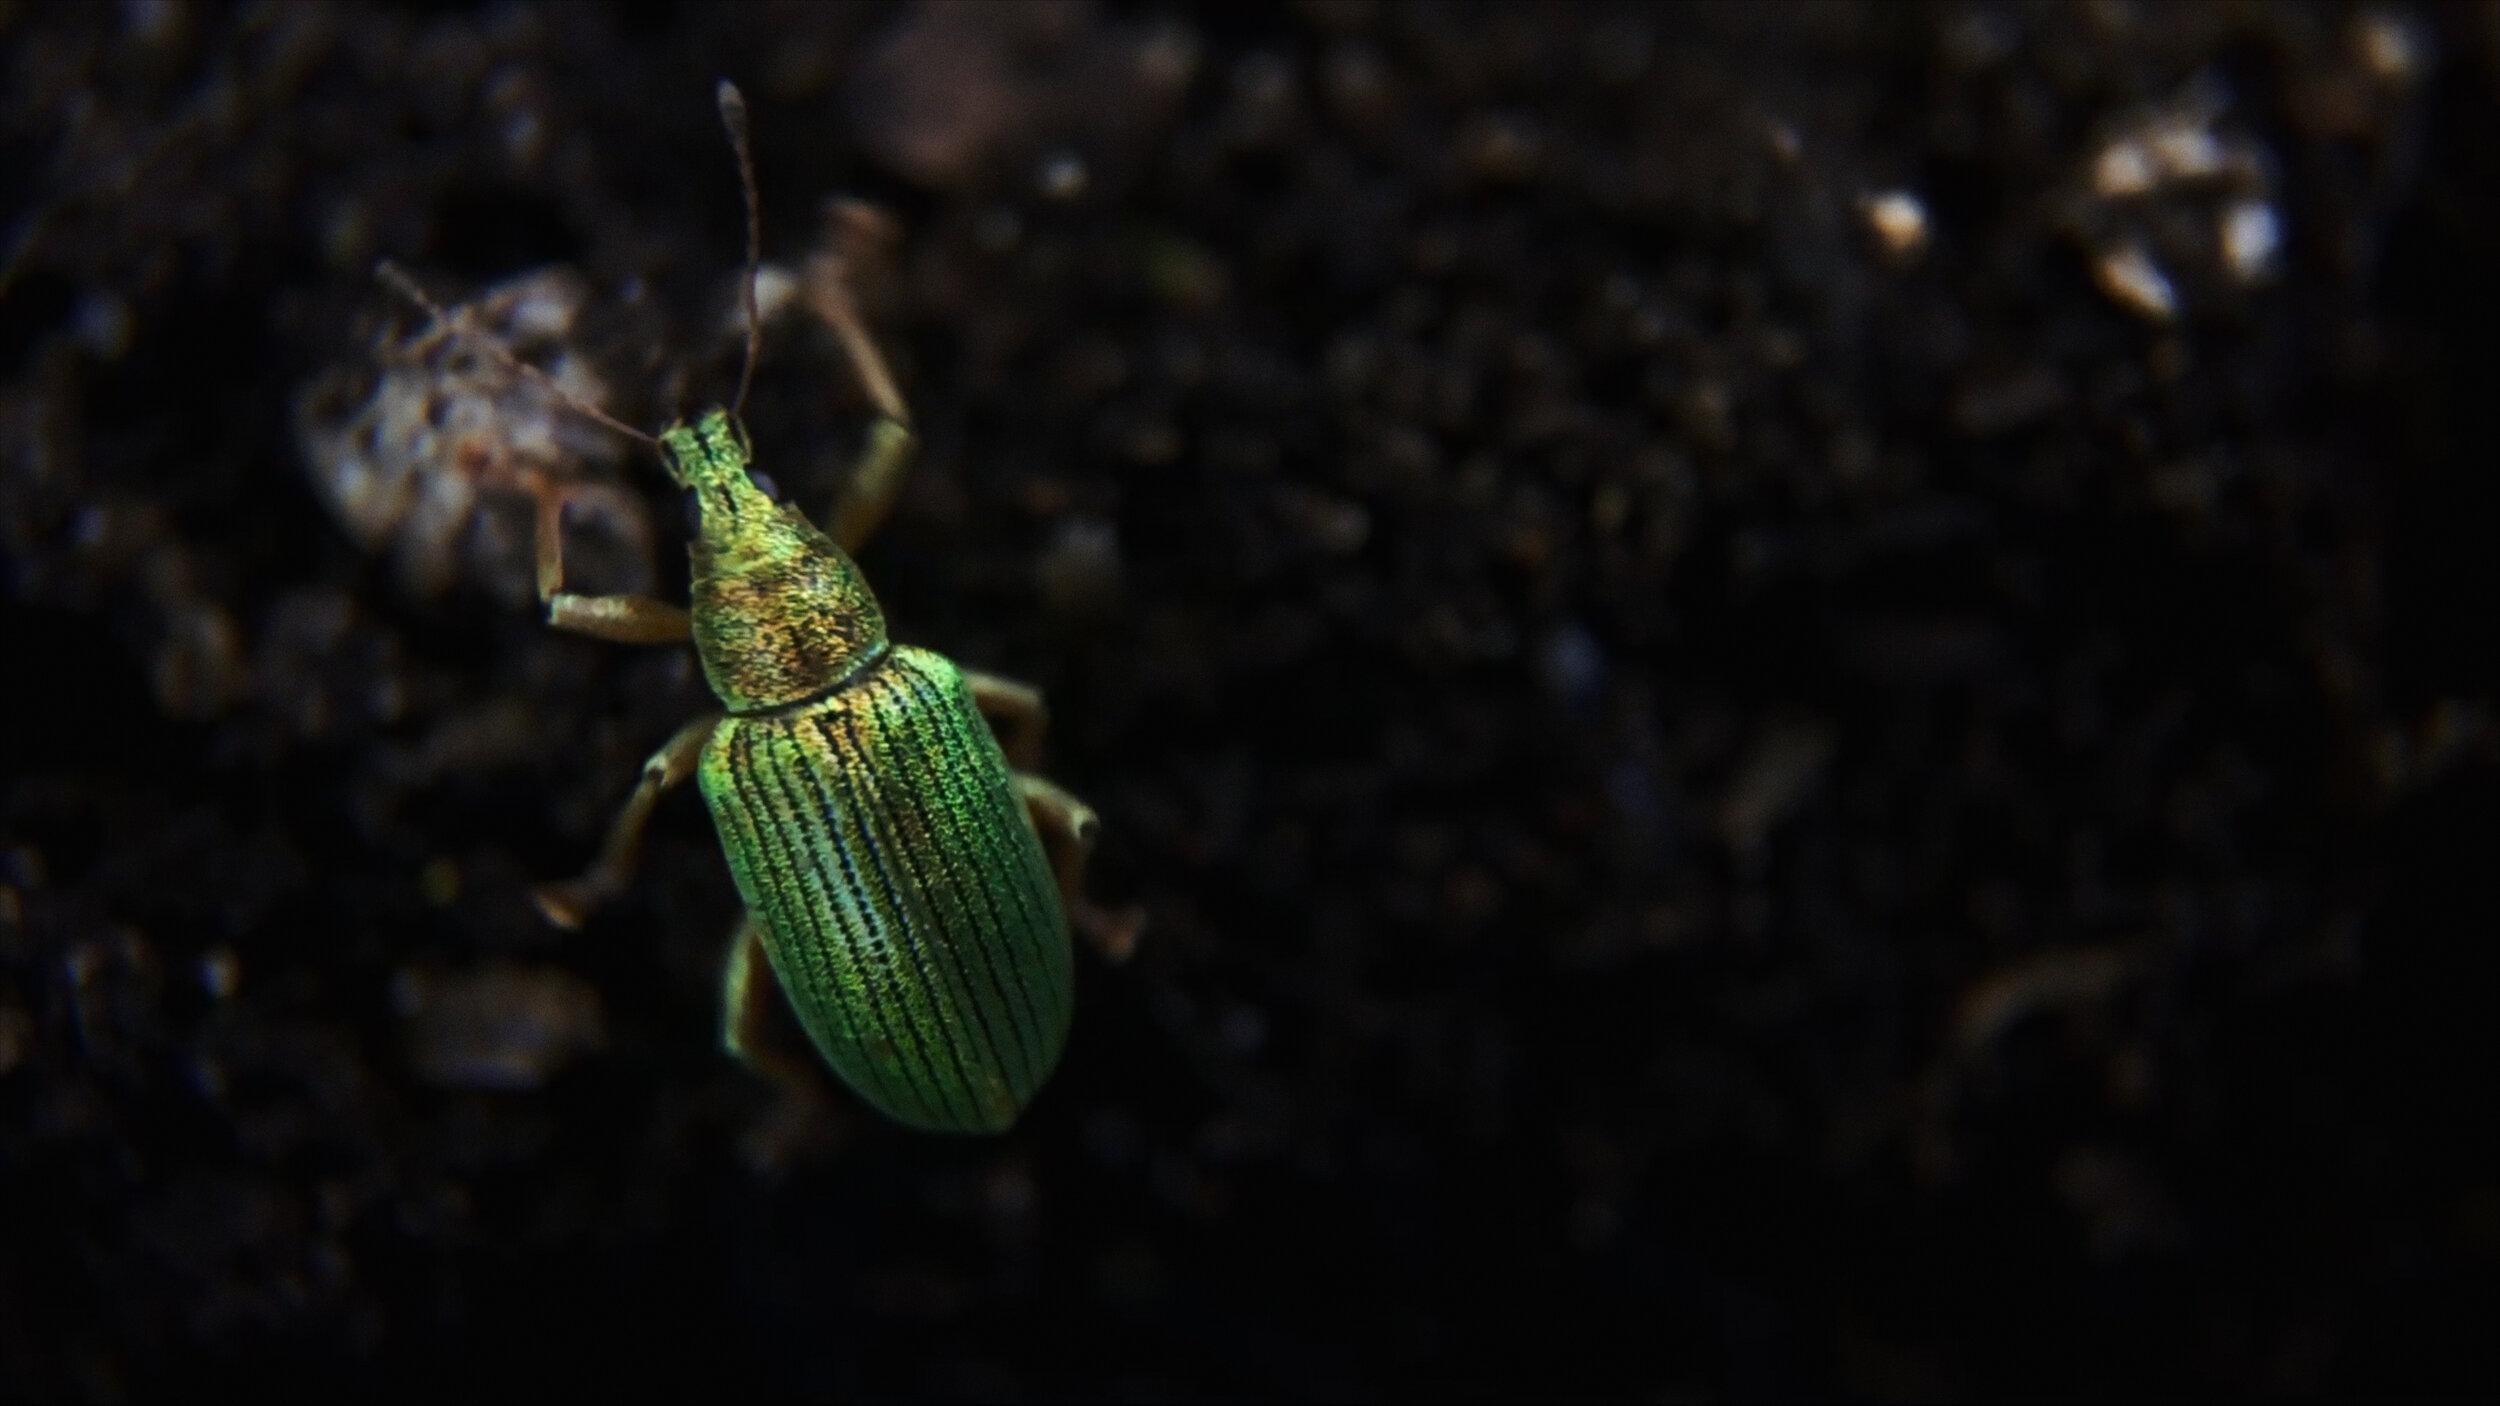 David+Blandy_The+World+After_2019_beetle 2.jpg